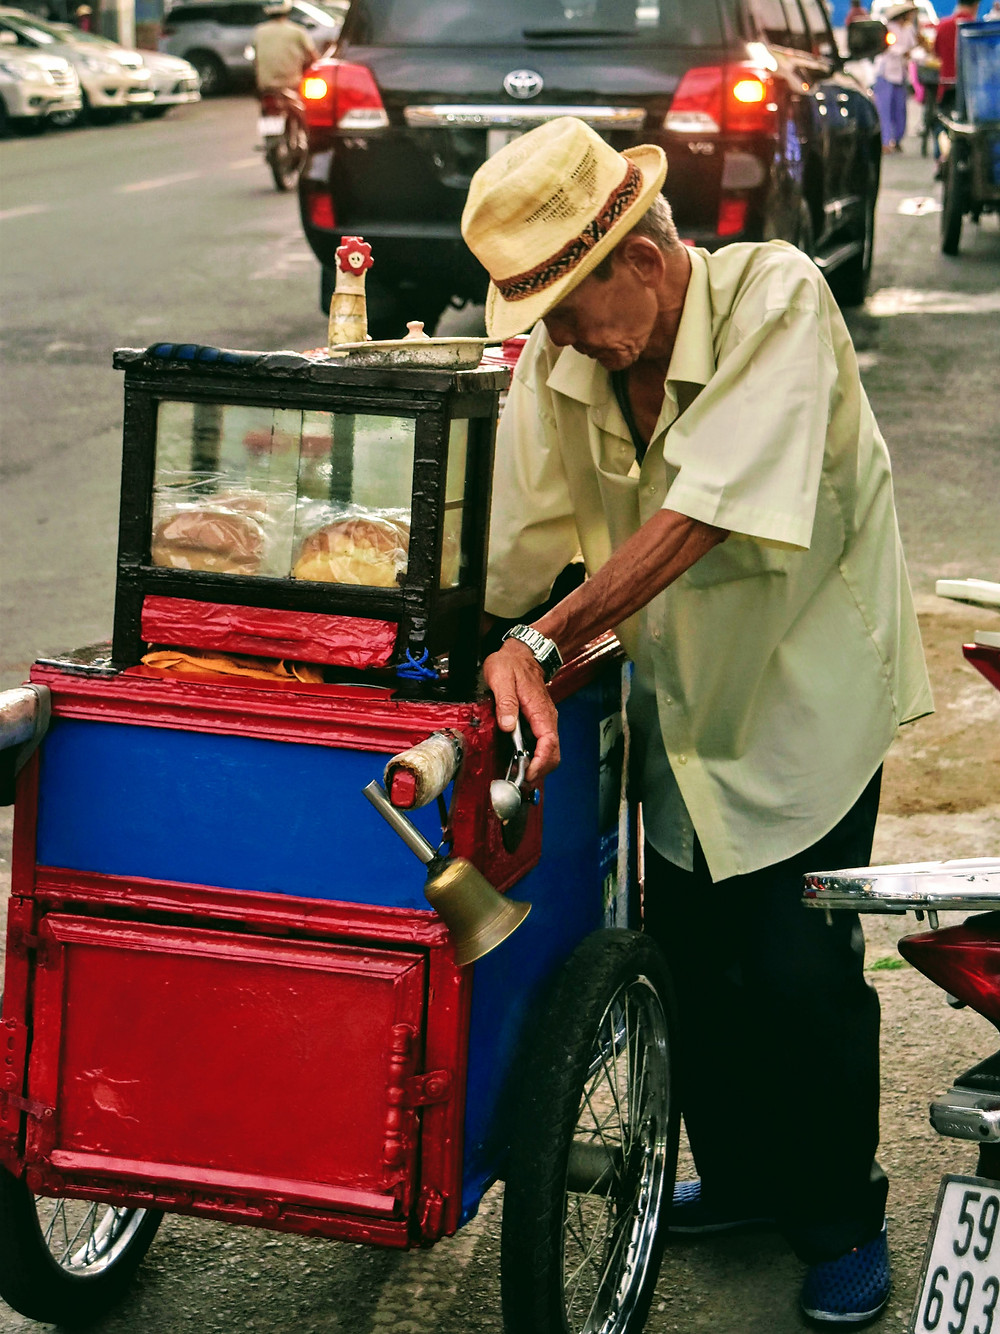 Street food vendor in Saigon Vietnam